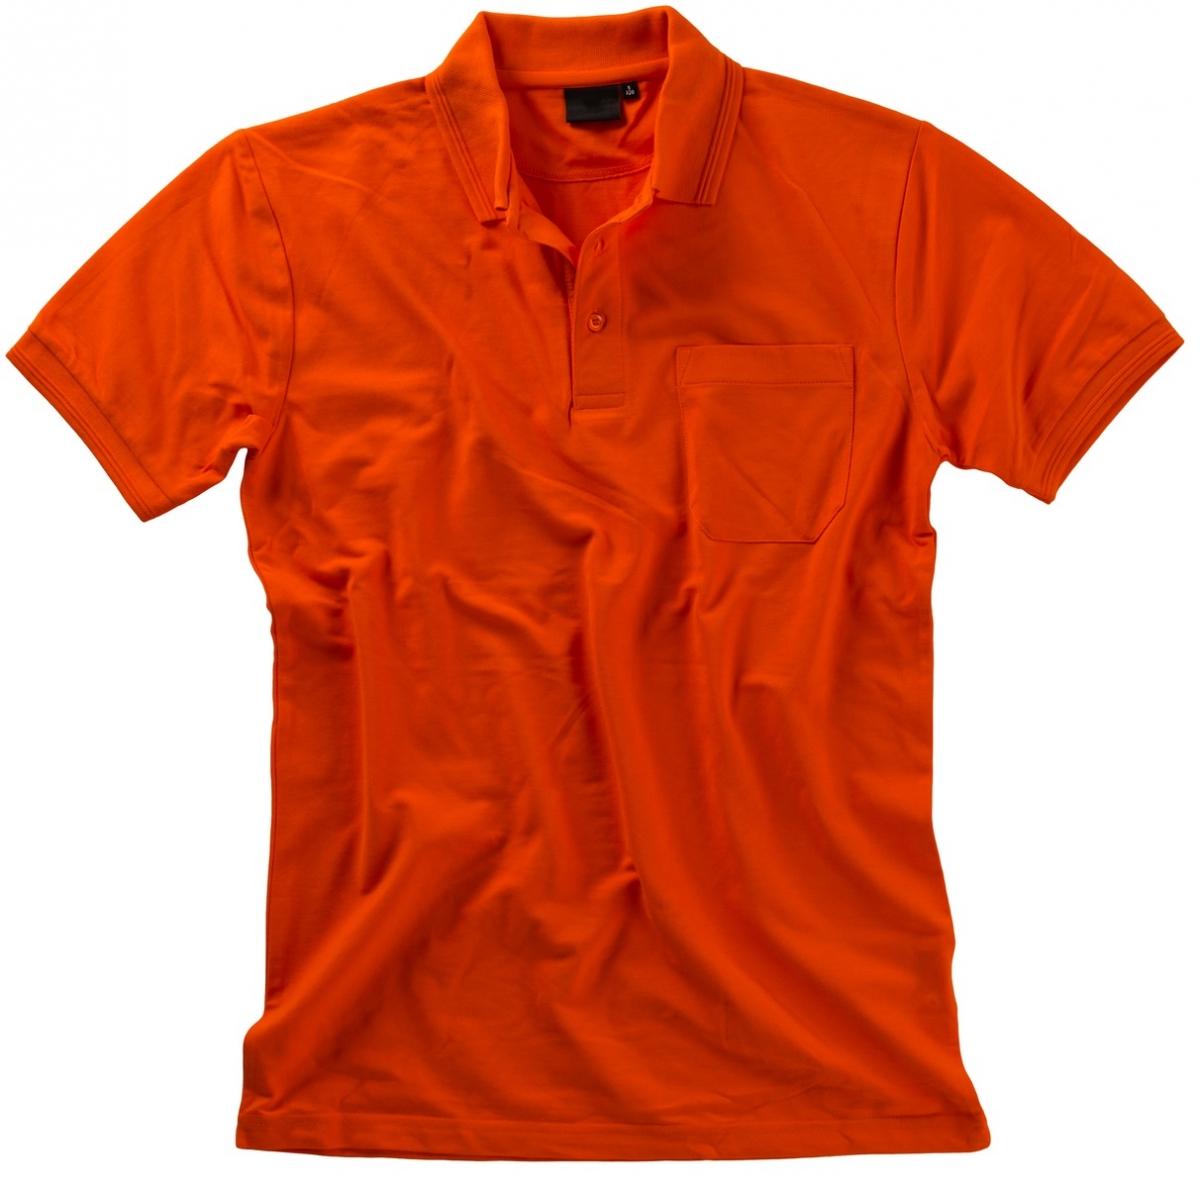 BEB Polo-Shirt Premium, MG 210/220, orange